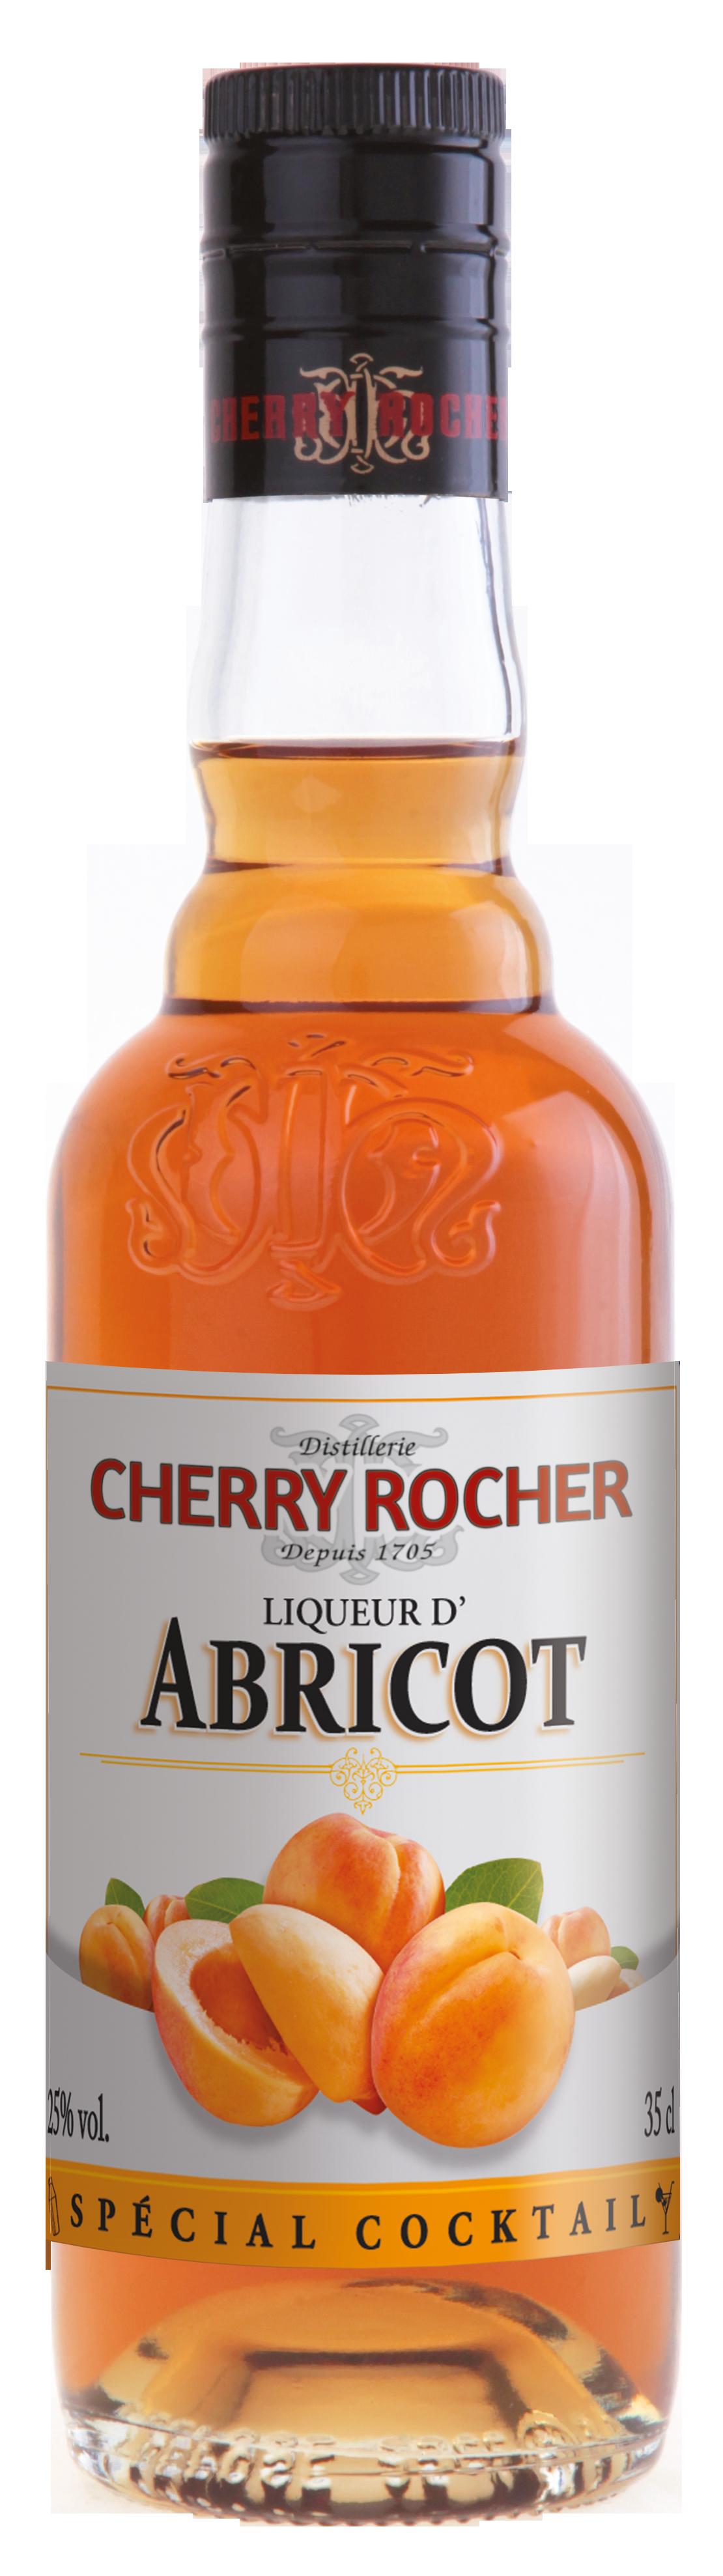 Abricot / Apricot - Cherry Rocher